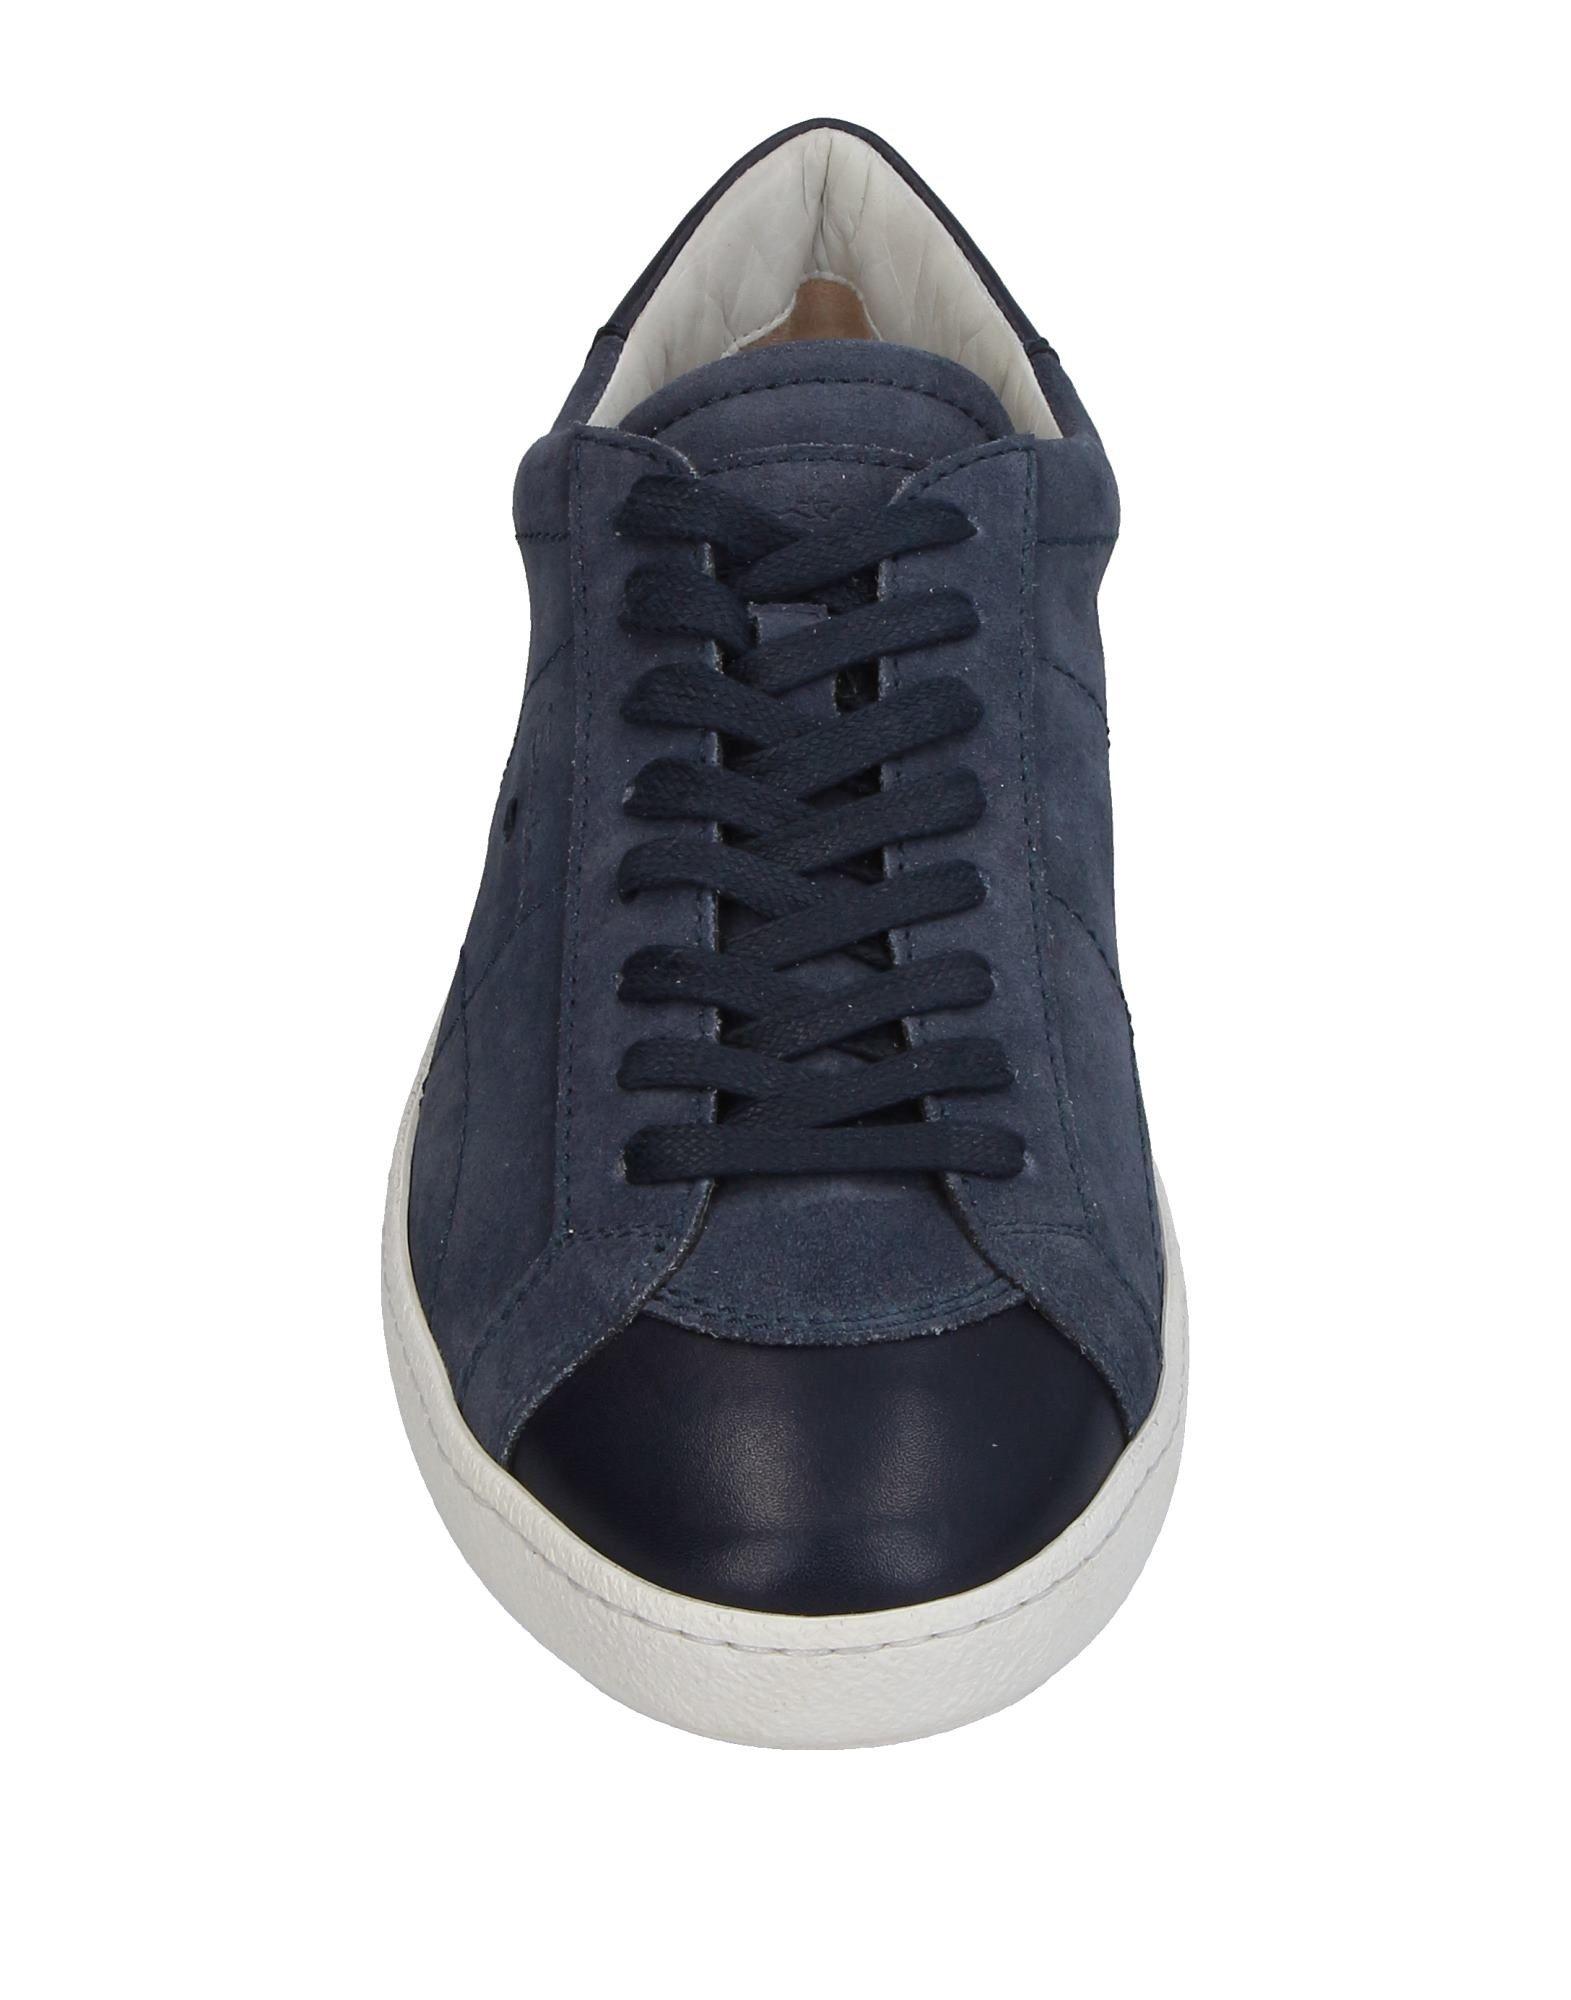 Moda Sneakers Santoni Uomo - - - 11410114OH c87274